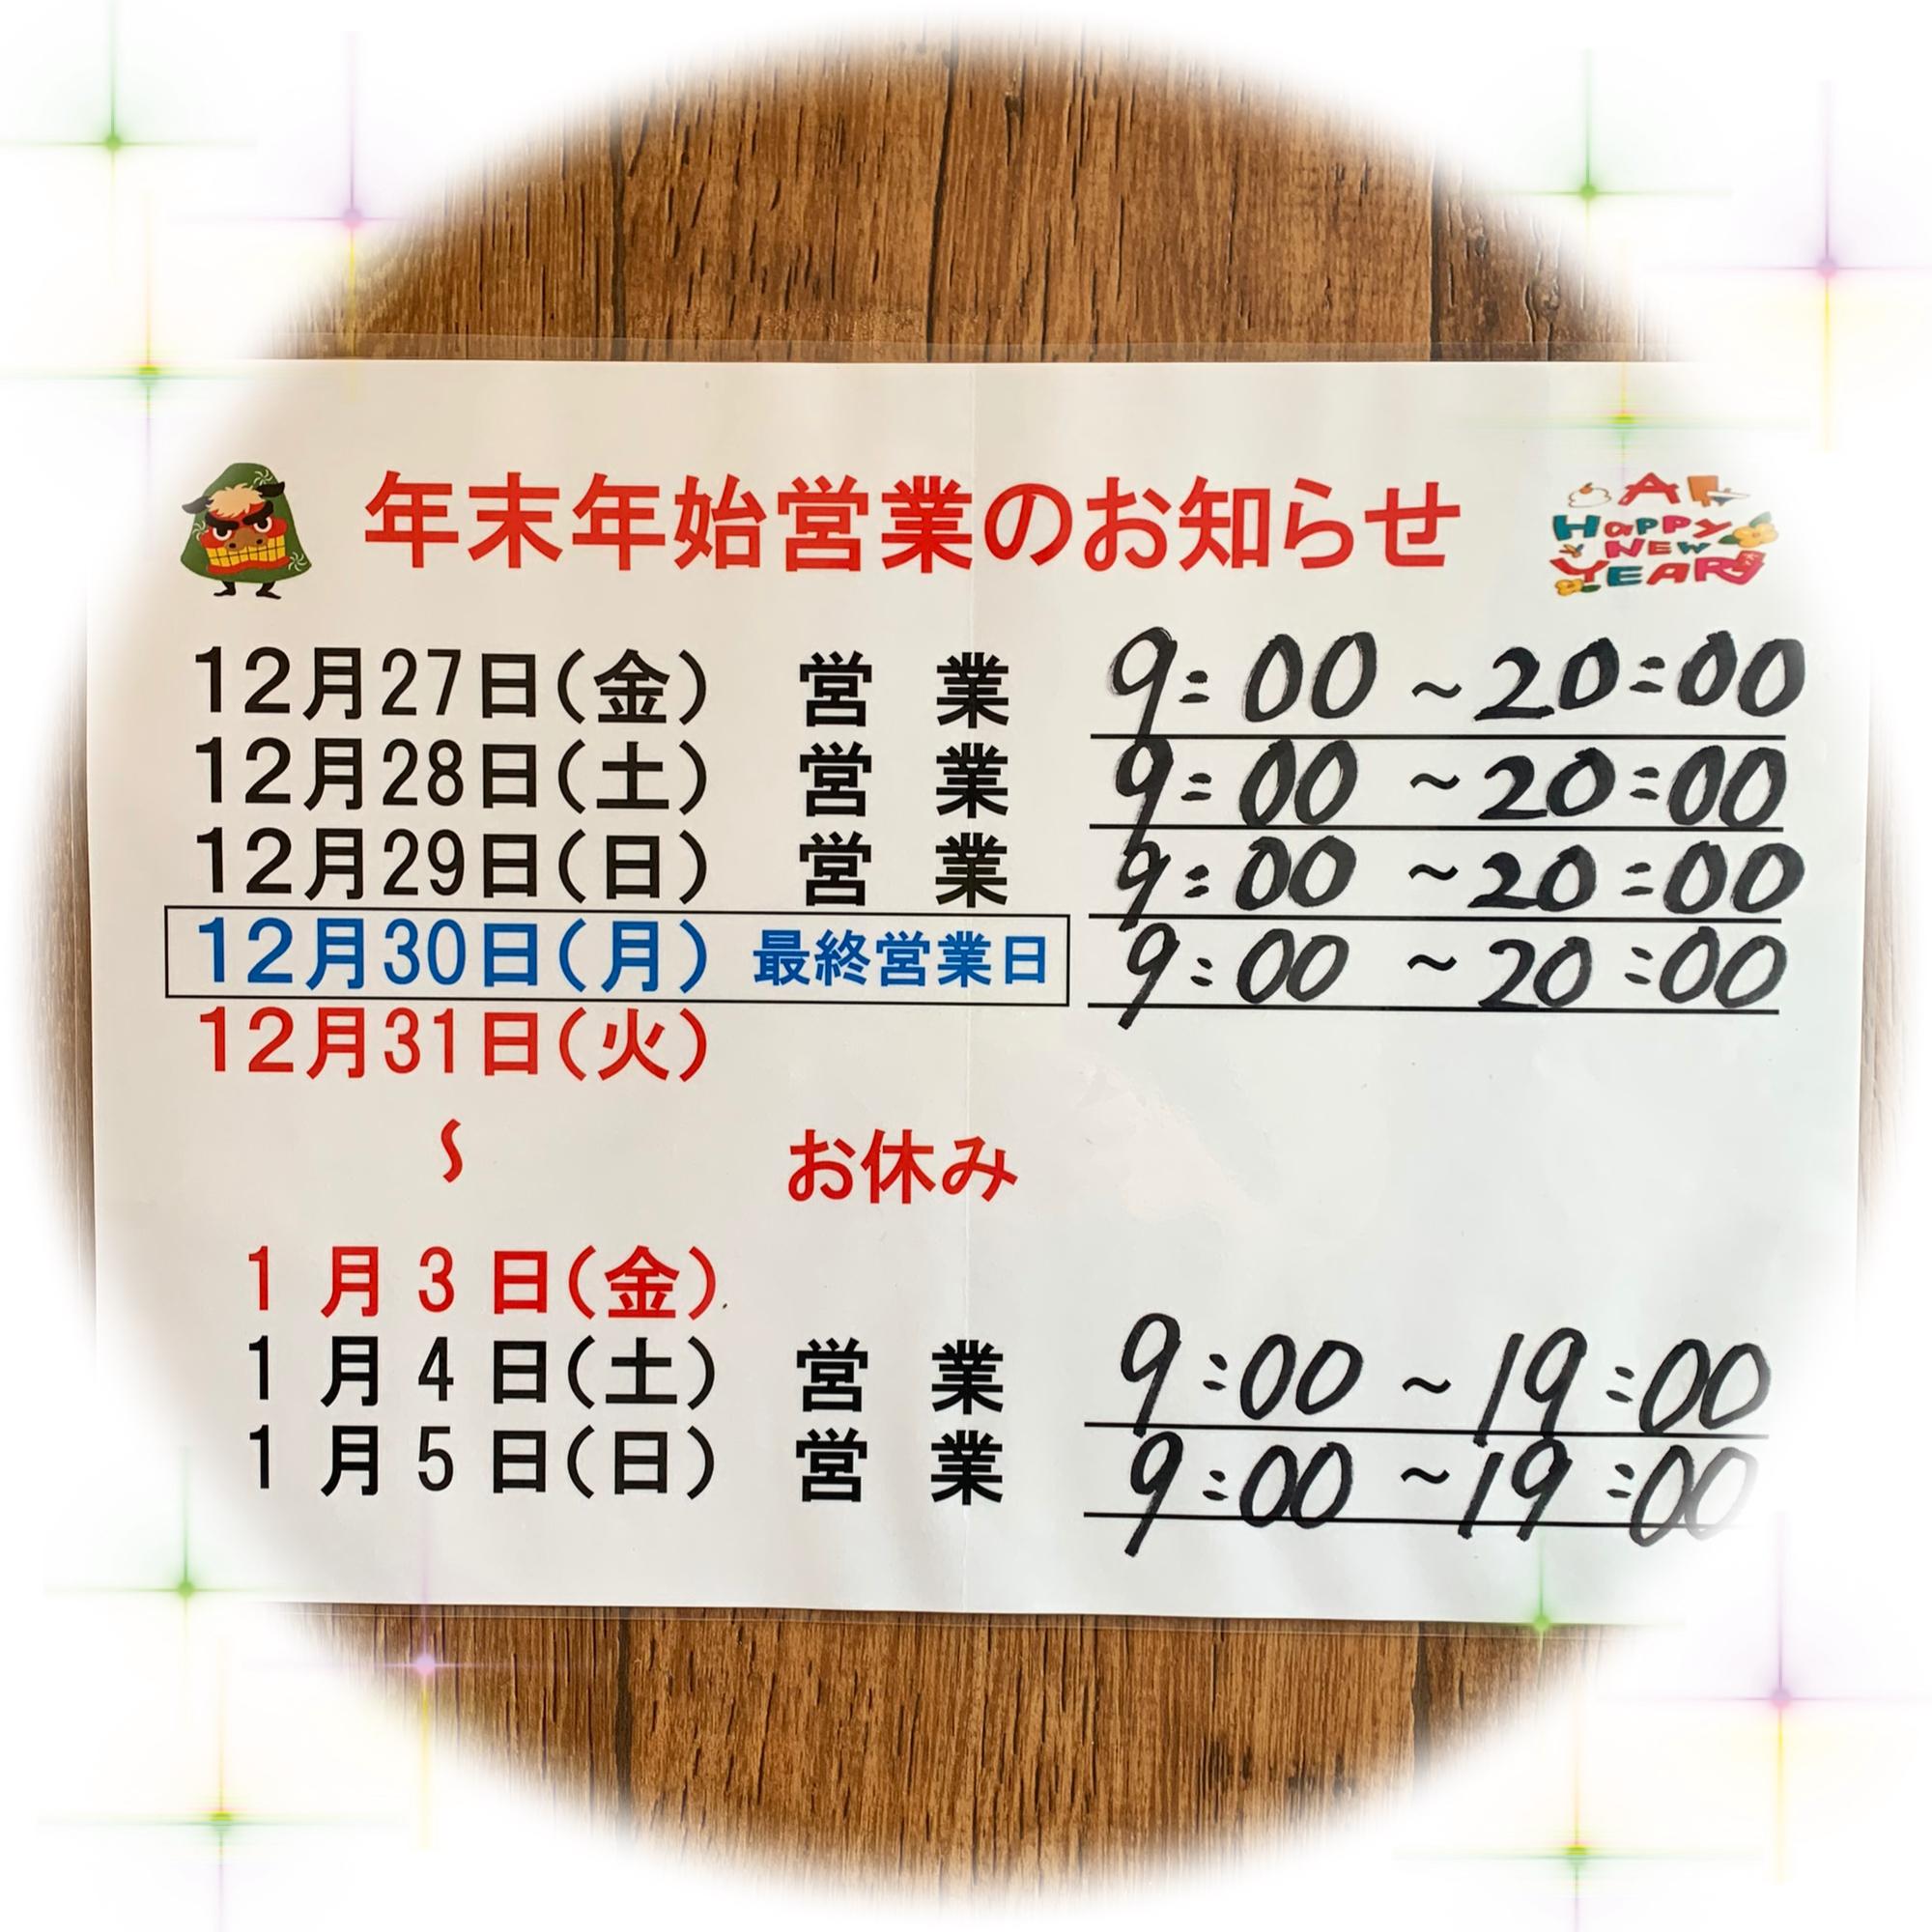 〜年末年始の営業時間〜